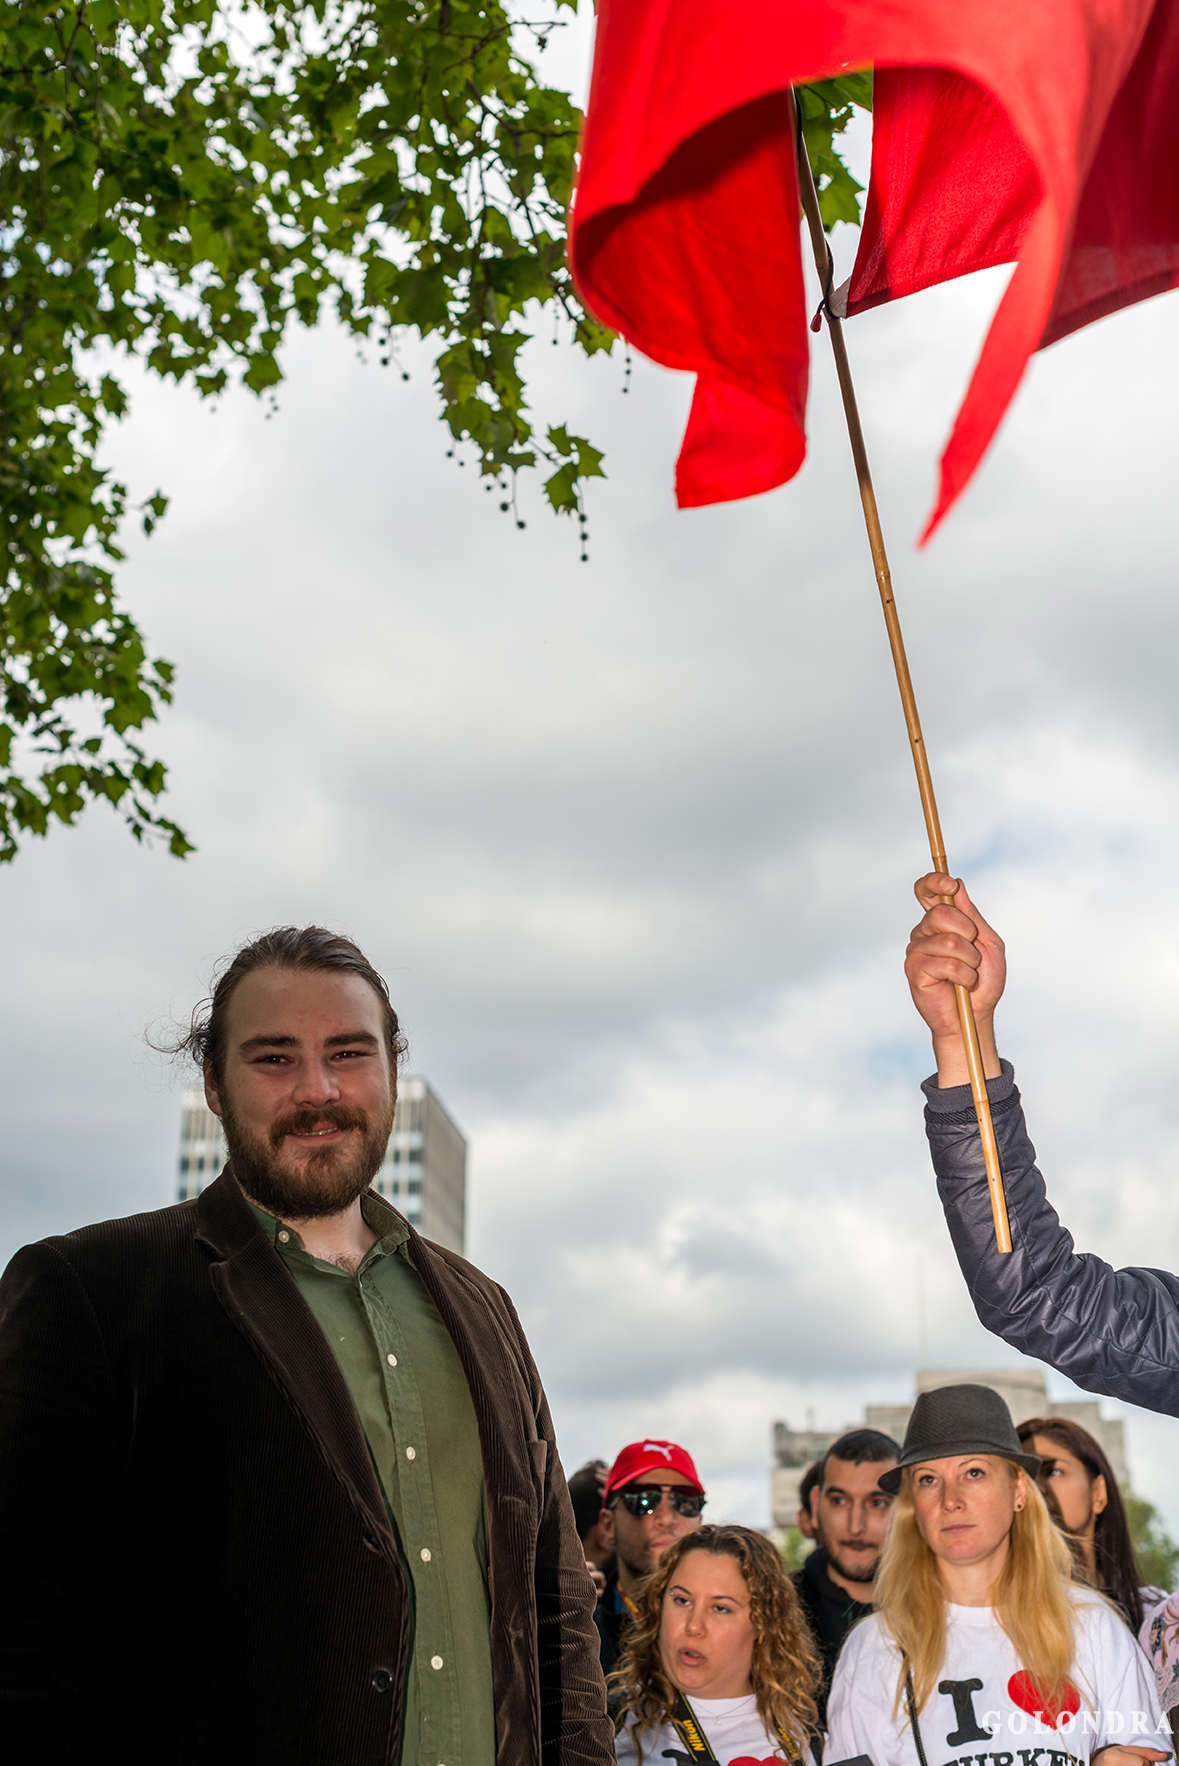 Protesting Turkish Government - Turk Hukumetini Protesto - Londra - London (27)